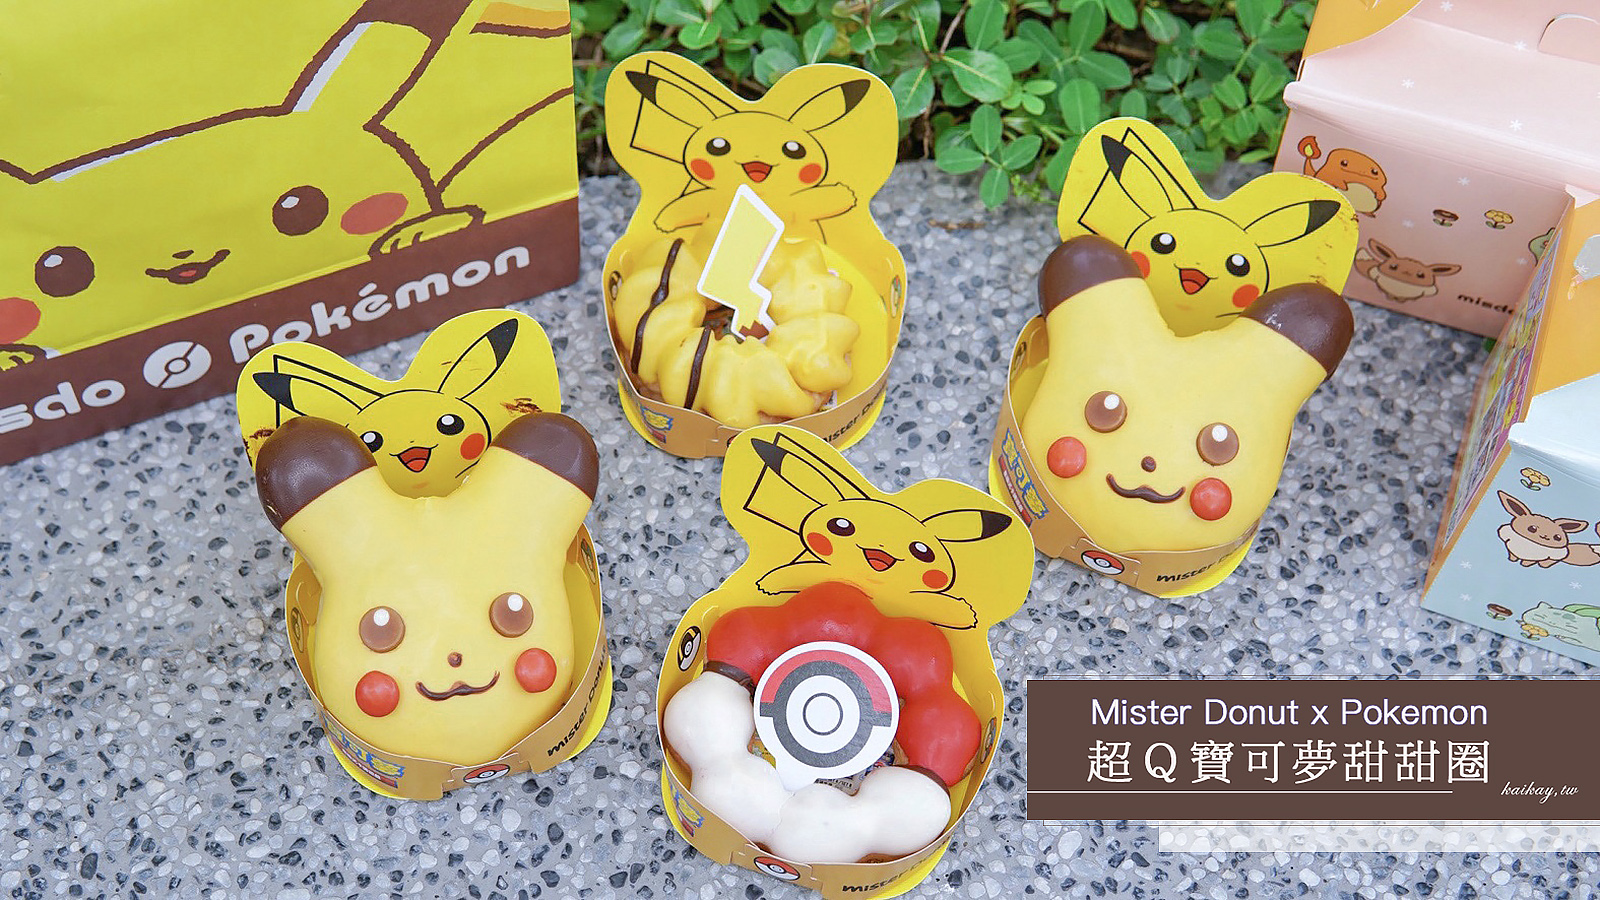 ☆【Mister Donut x Pokémon 開箱】寶可夢聯名款。皮卡丘甜甜圈、寶貝球波堤、皮卡丘の尾巴 @凱的日本食尚日記